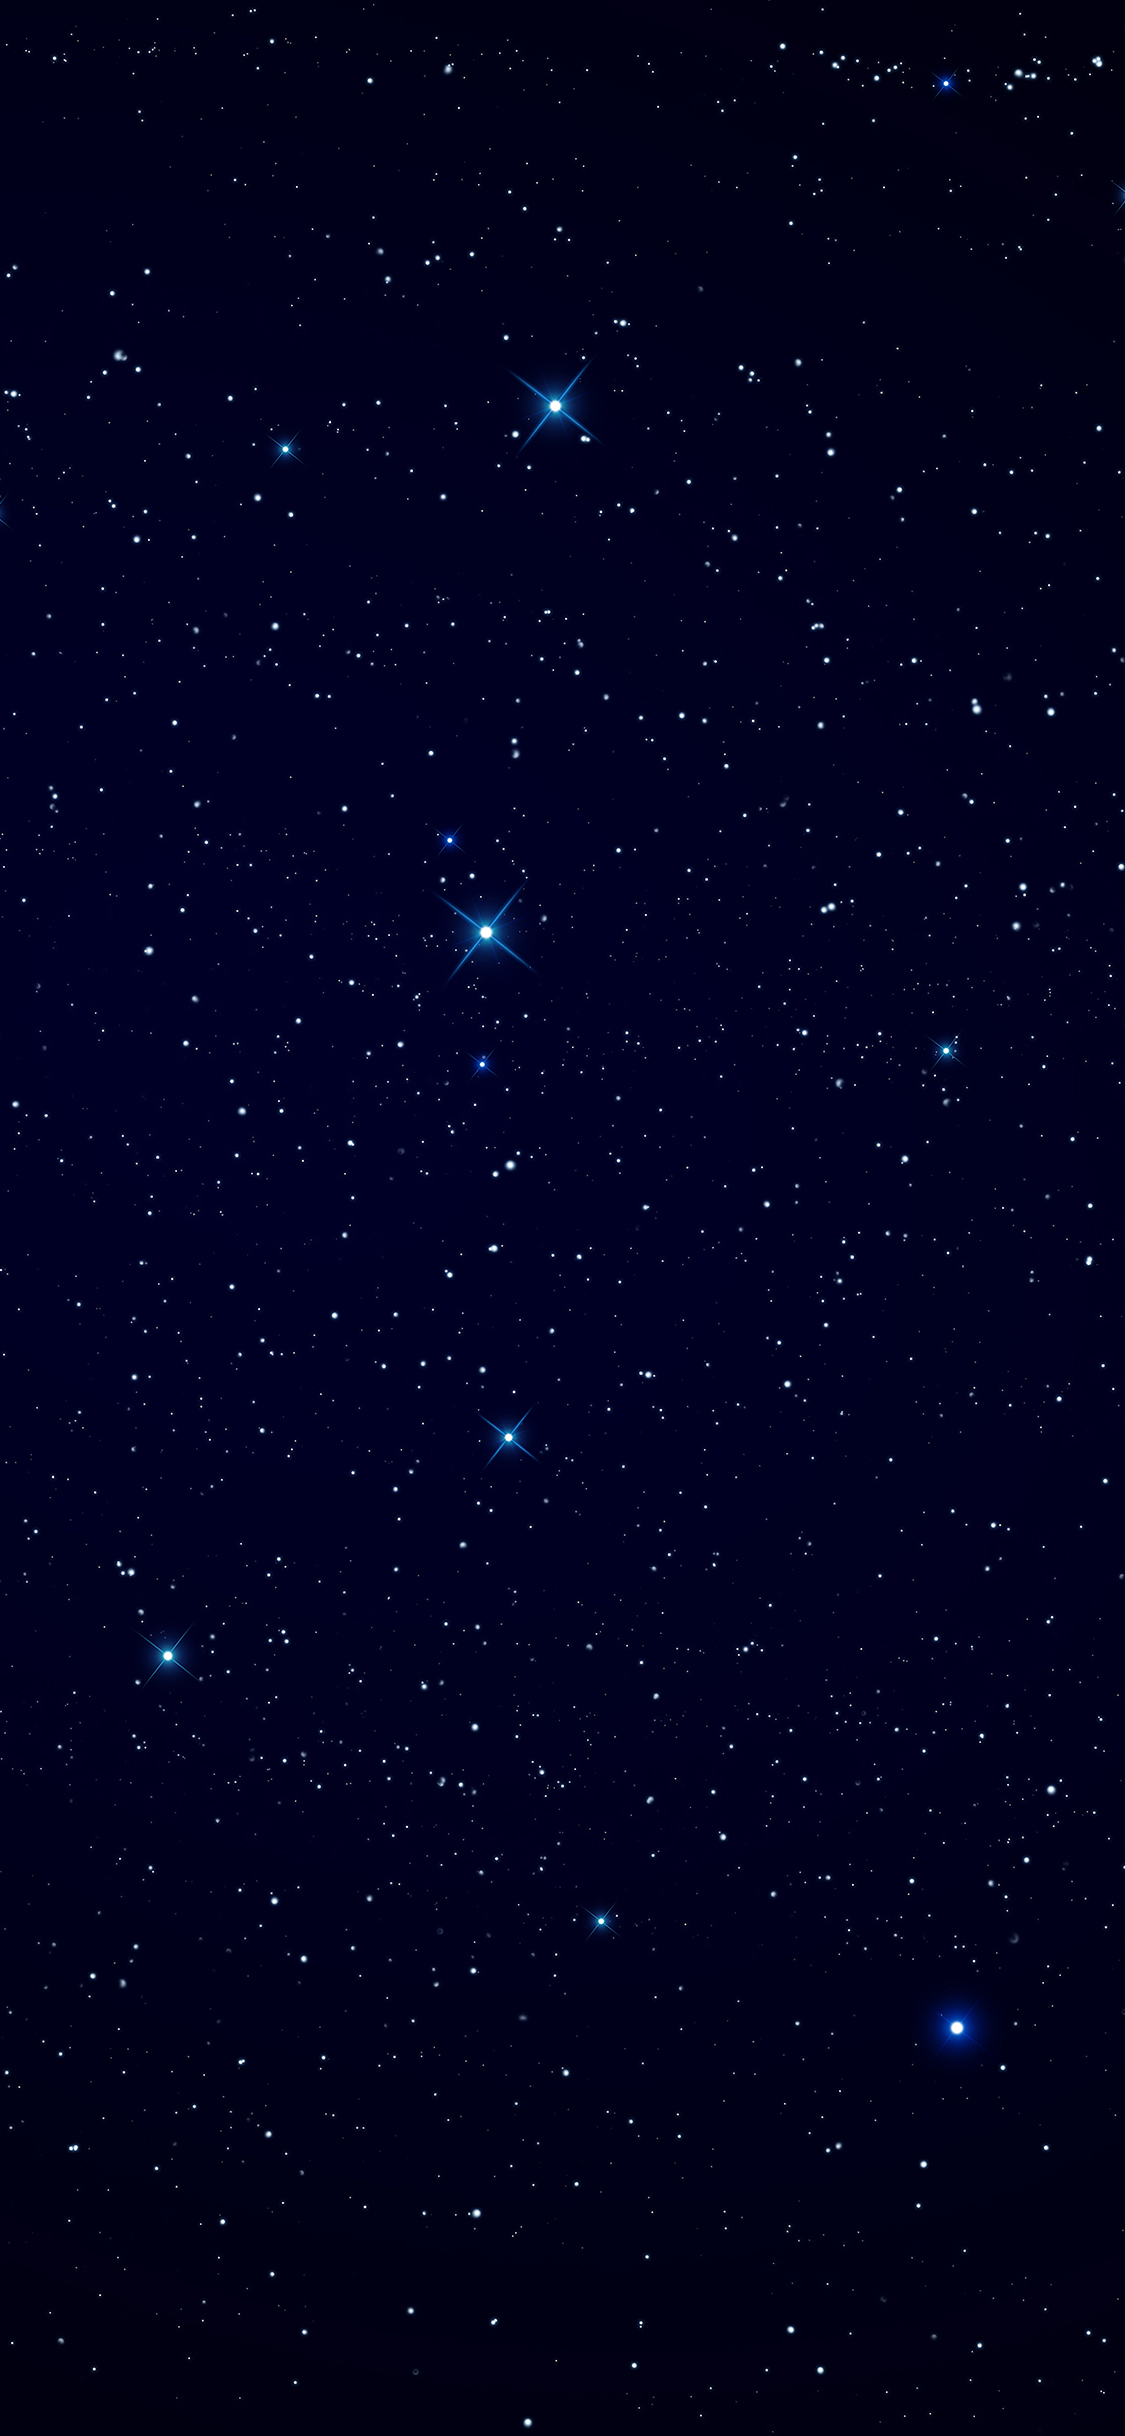 iPhoneXpapers.com-Apple-iPhone-wallpaper-ac01-wallpaper-space-star-night-dark